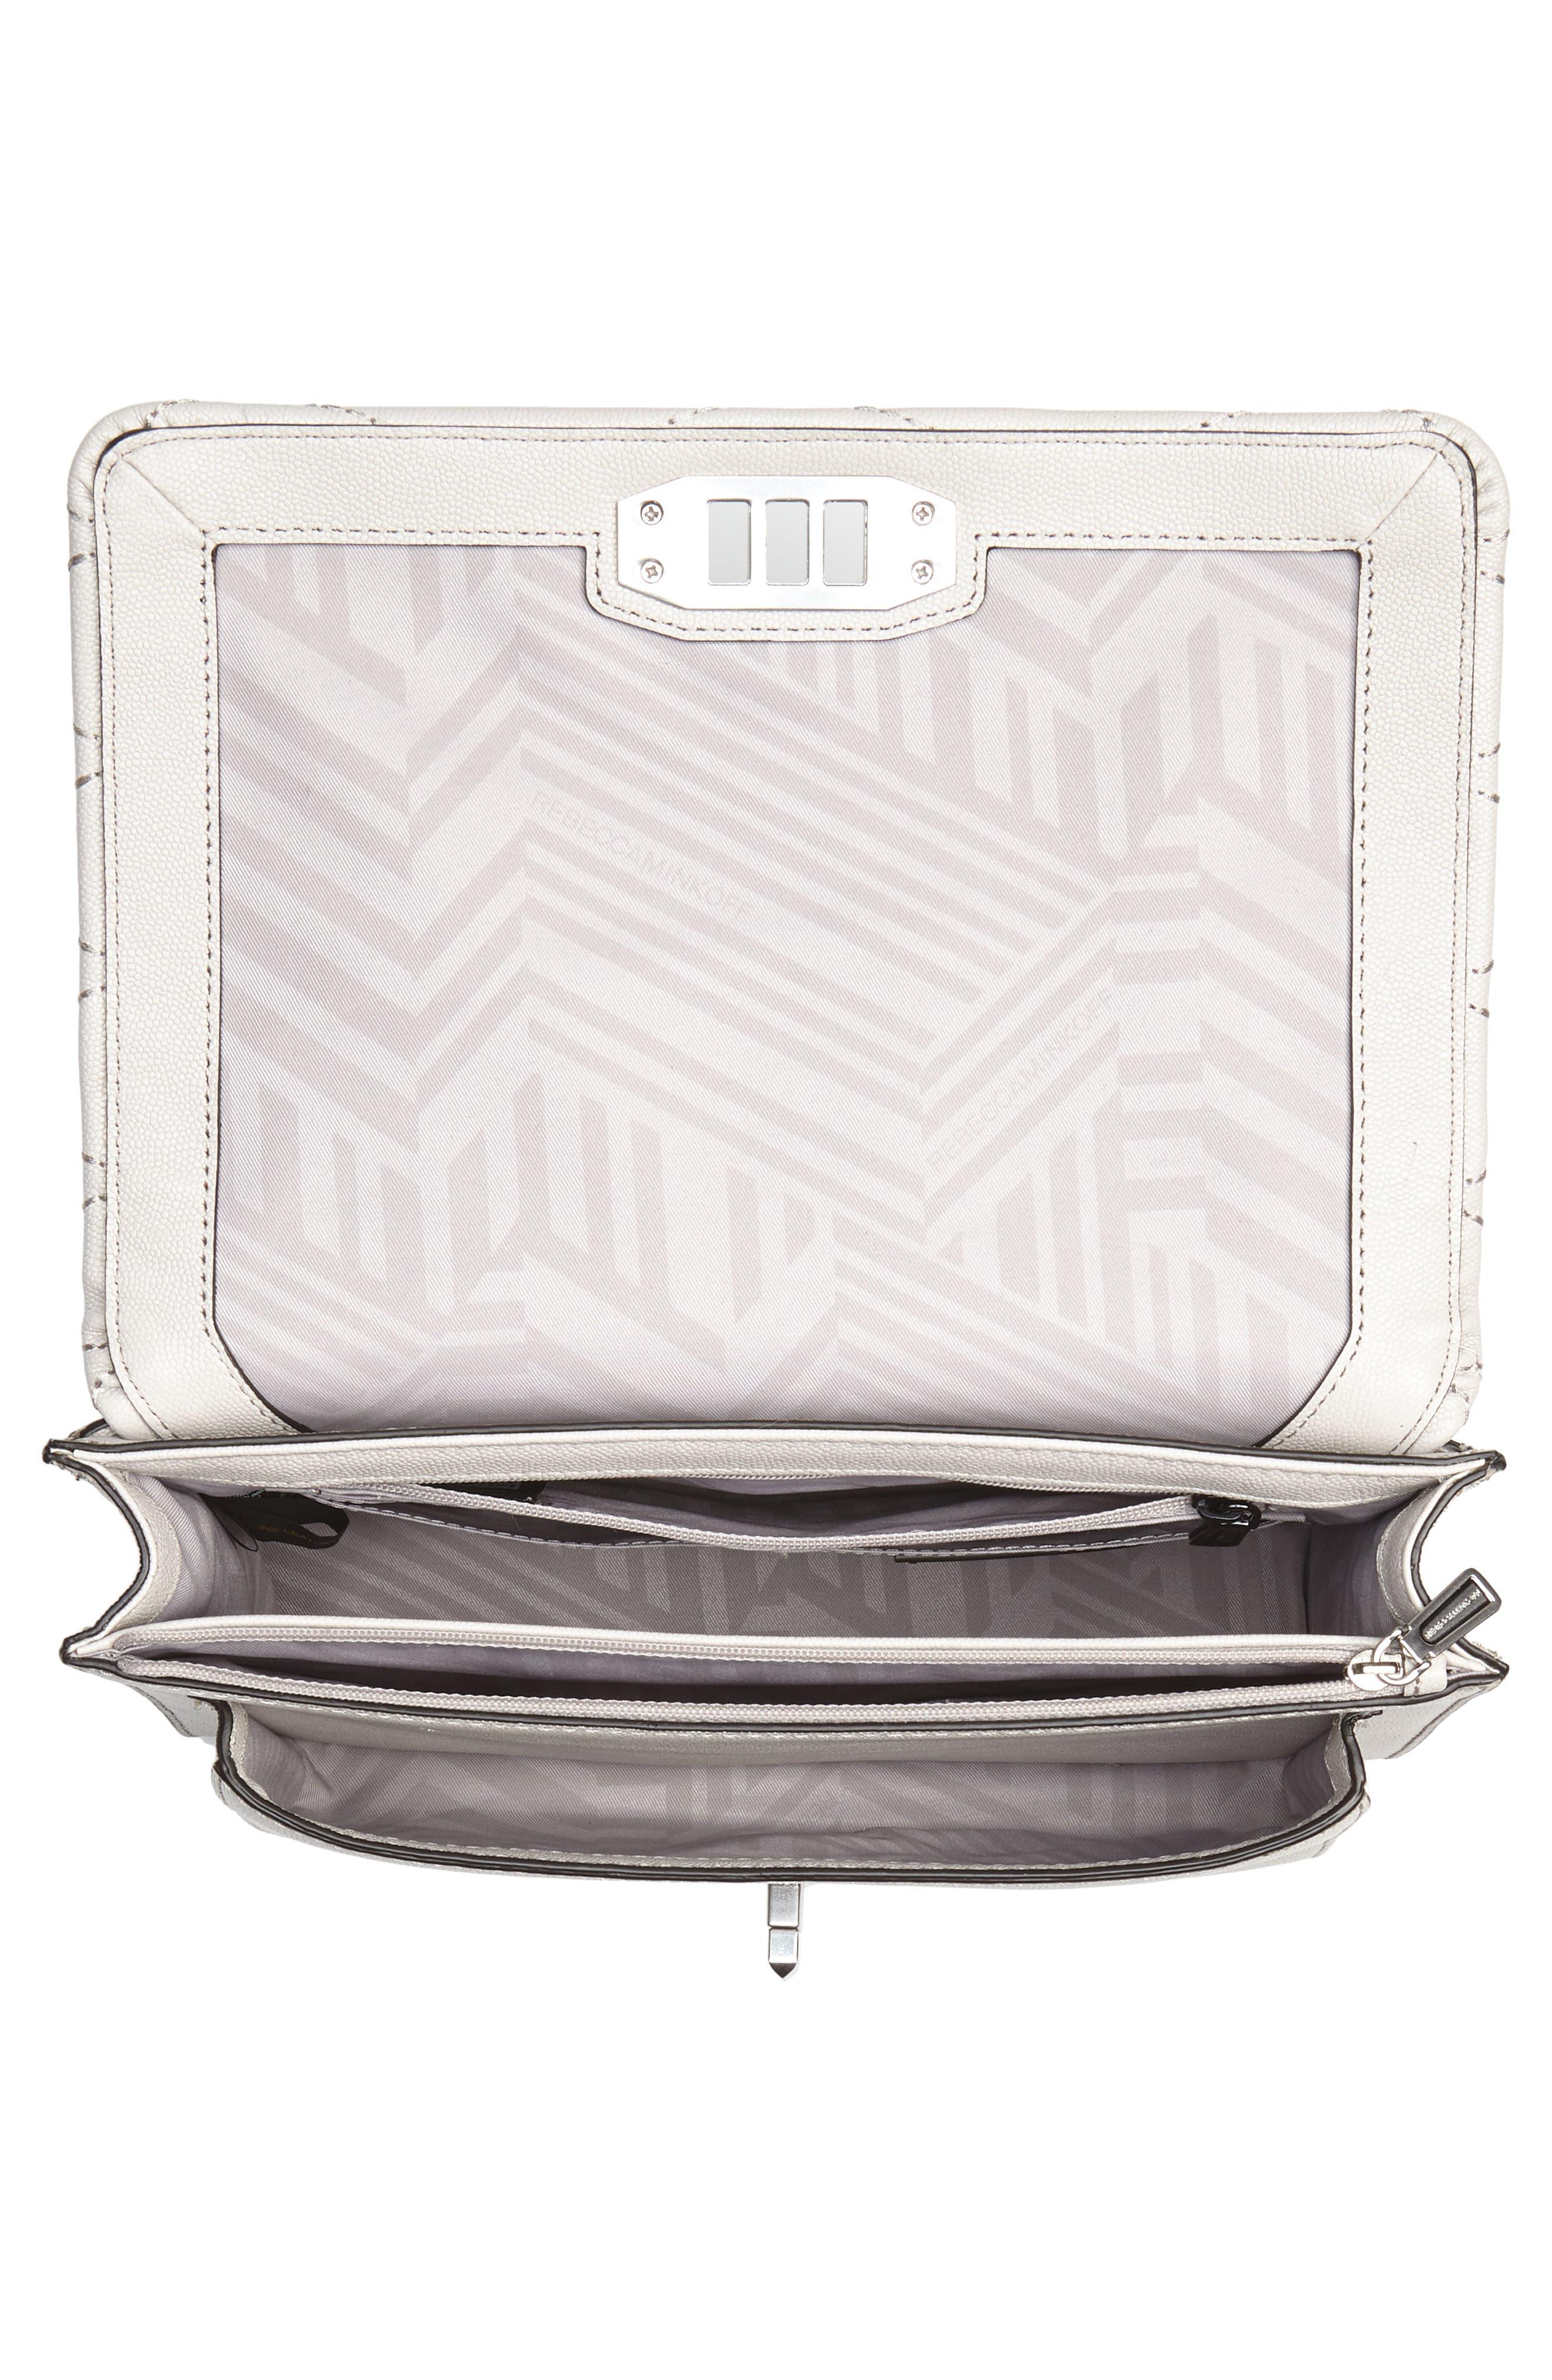 Medium Je T'aime Convertible Leather Crossbody Bag,                             Alternate thumbnail 32, color,